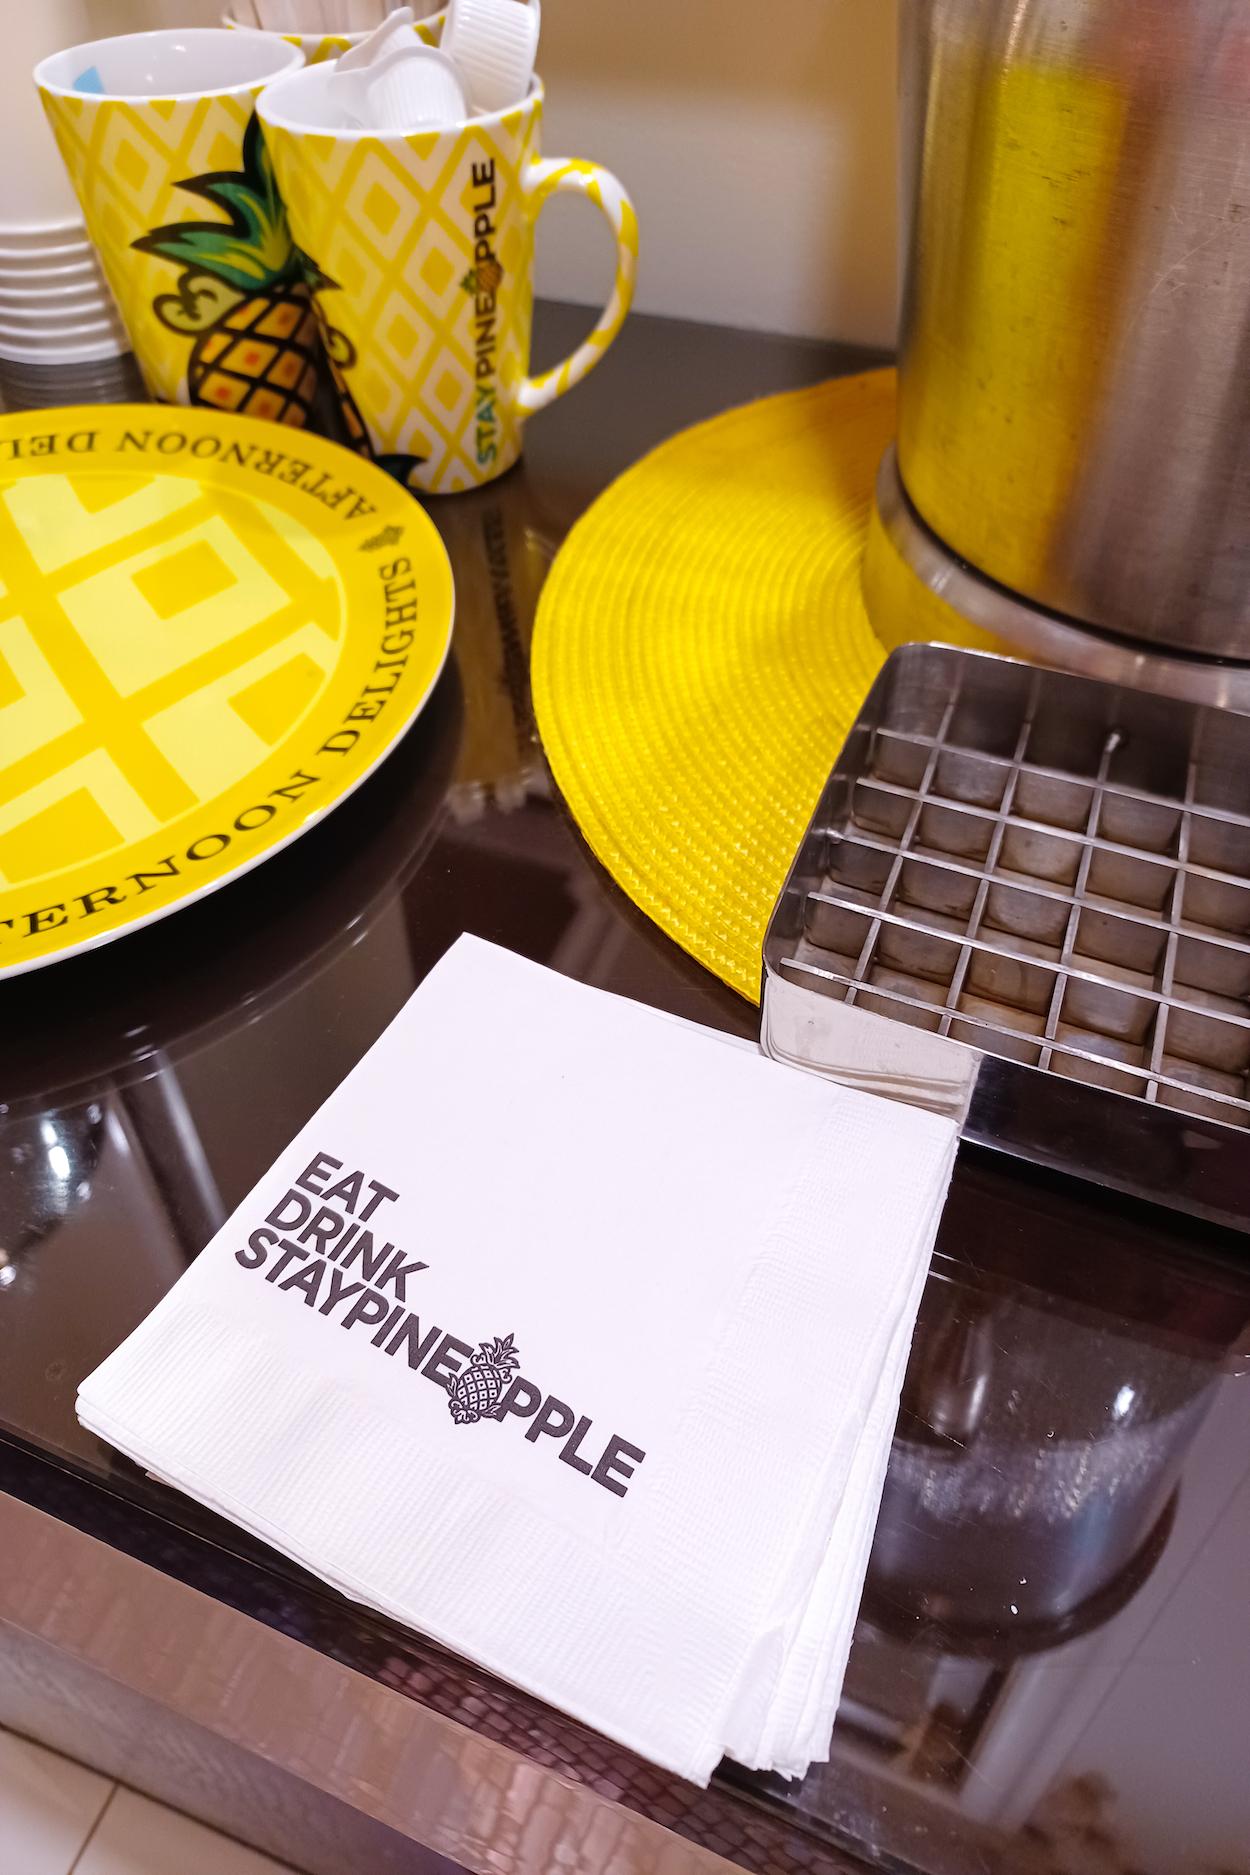 Napkin with StayPineapple branding